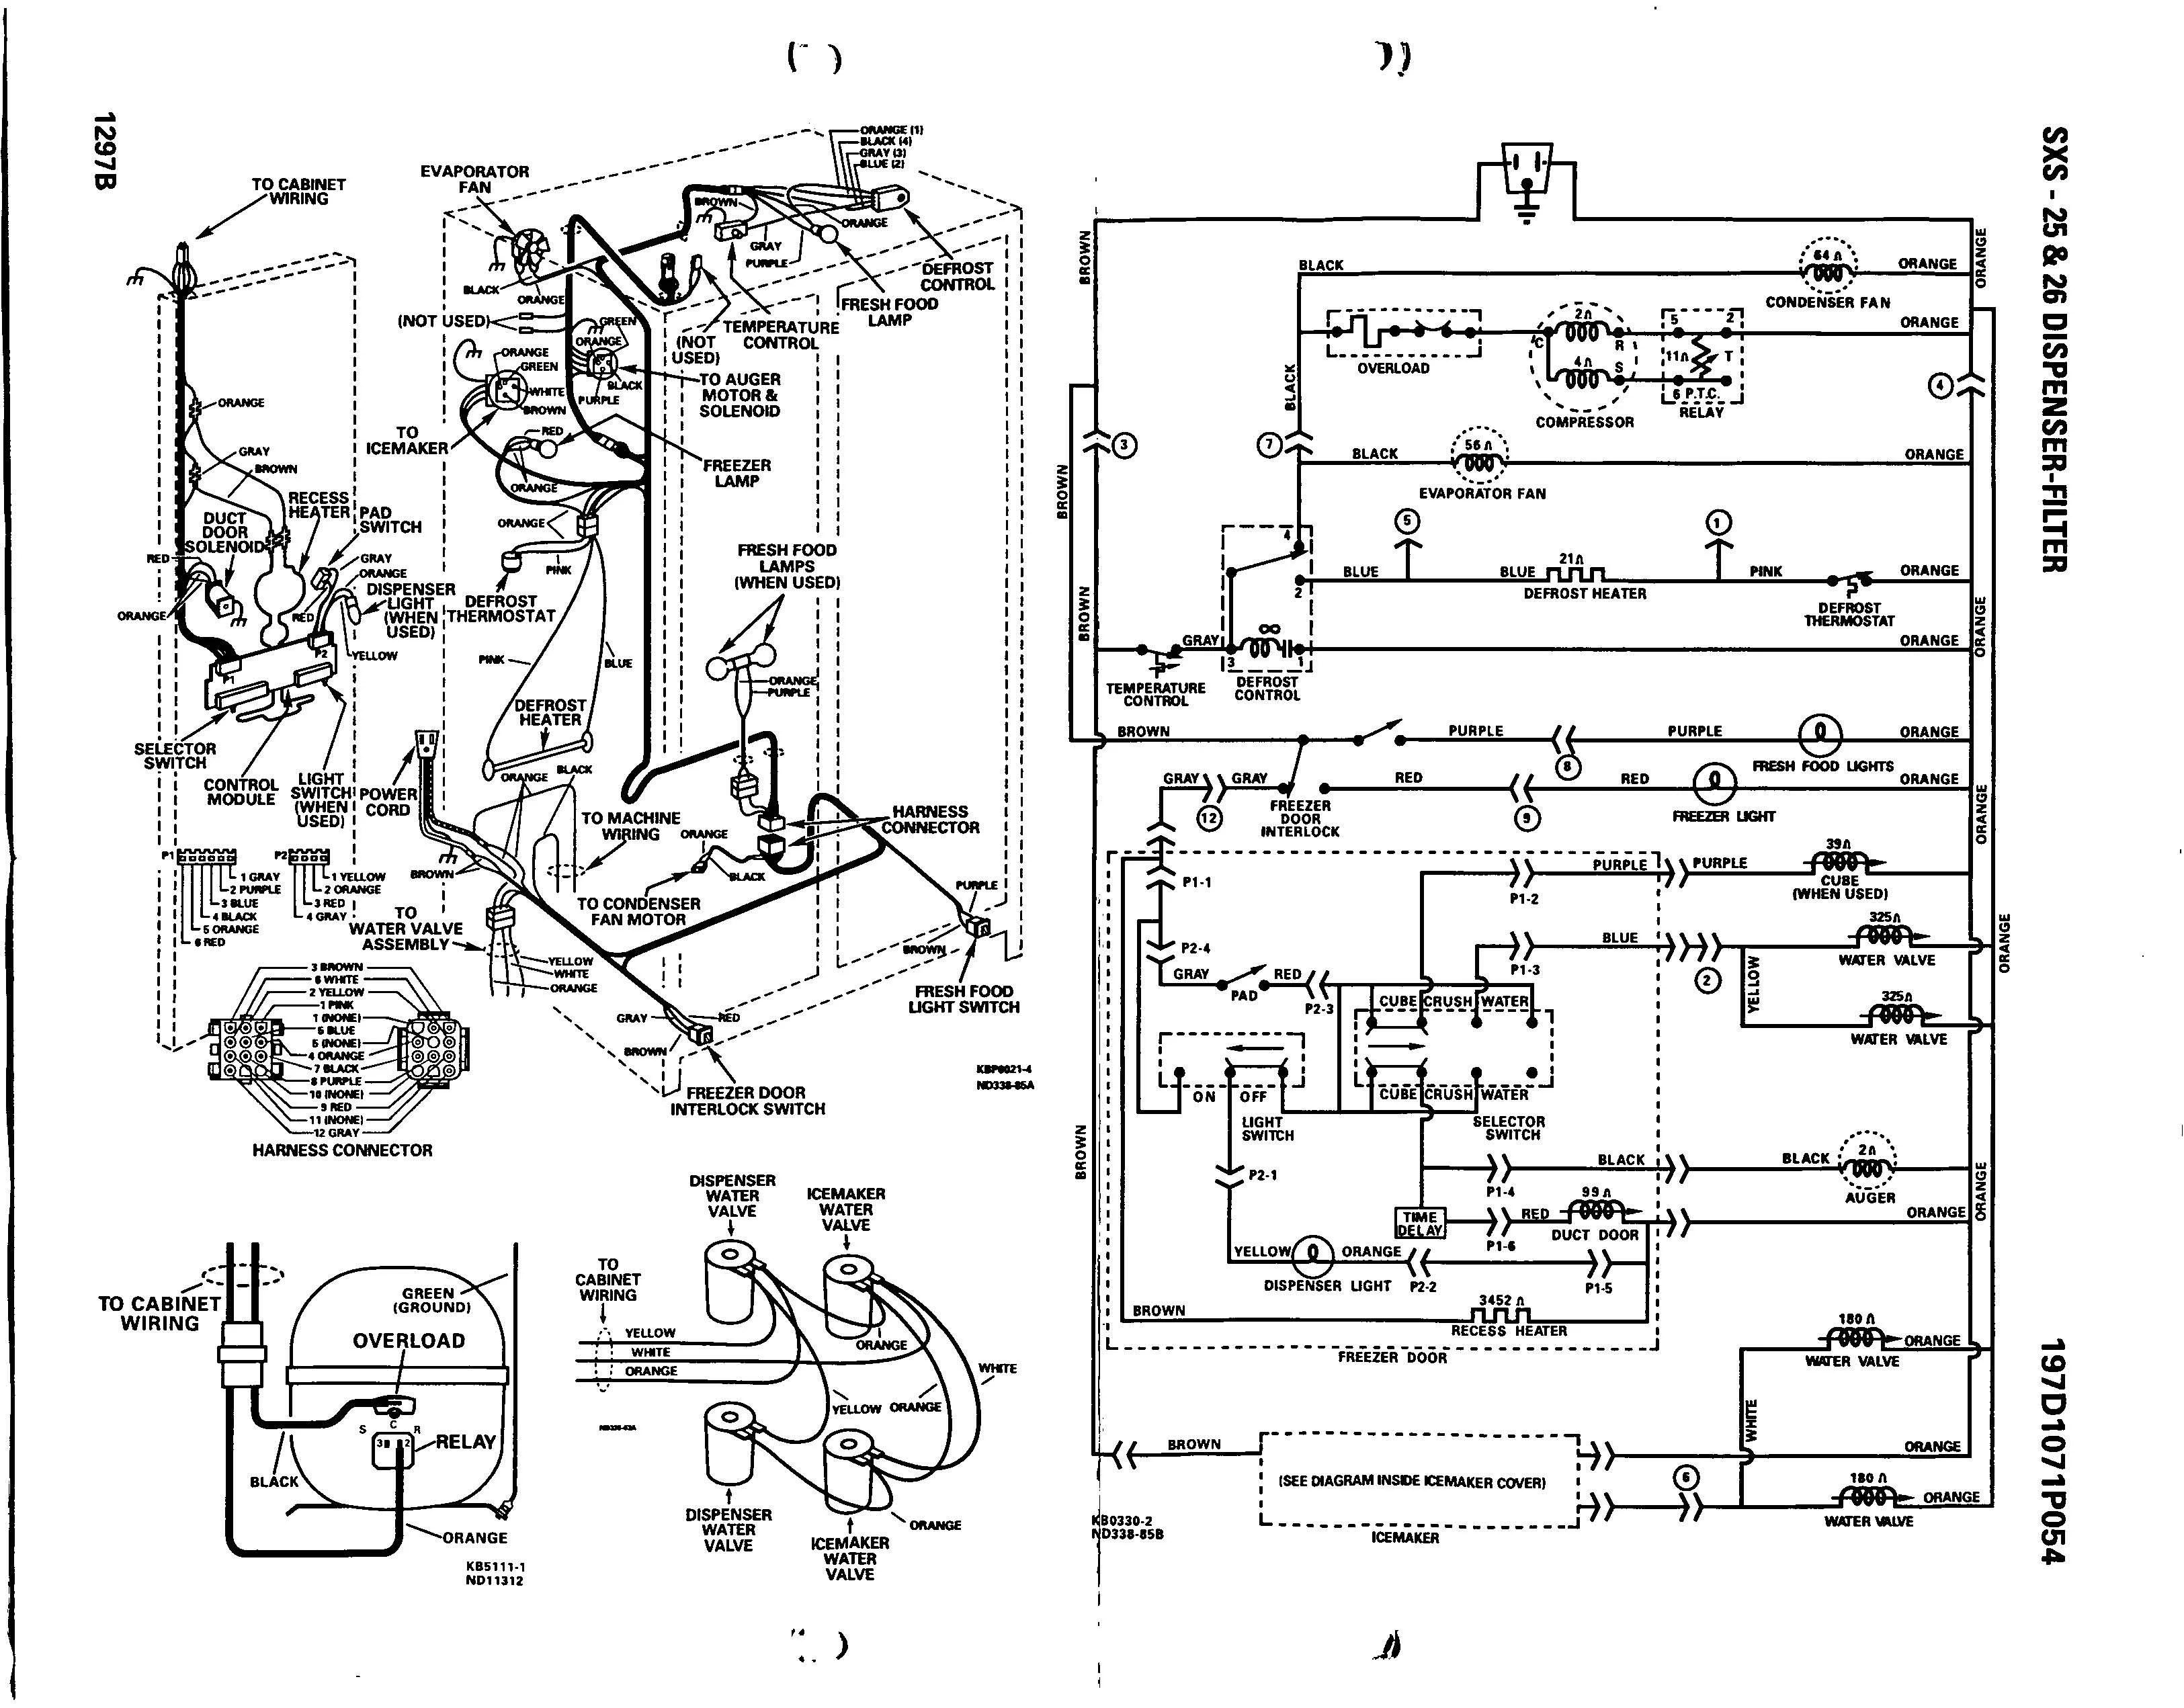 maytag refrigerator thermostat schematic diagram 30 amp plug wiring for frigidaire upright freezer